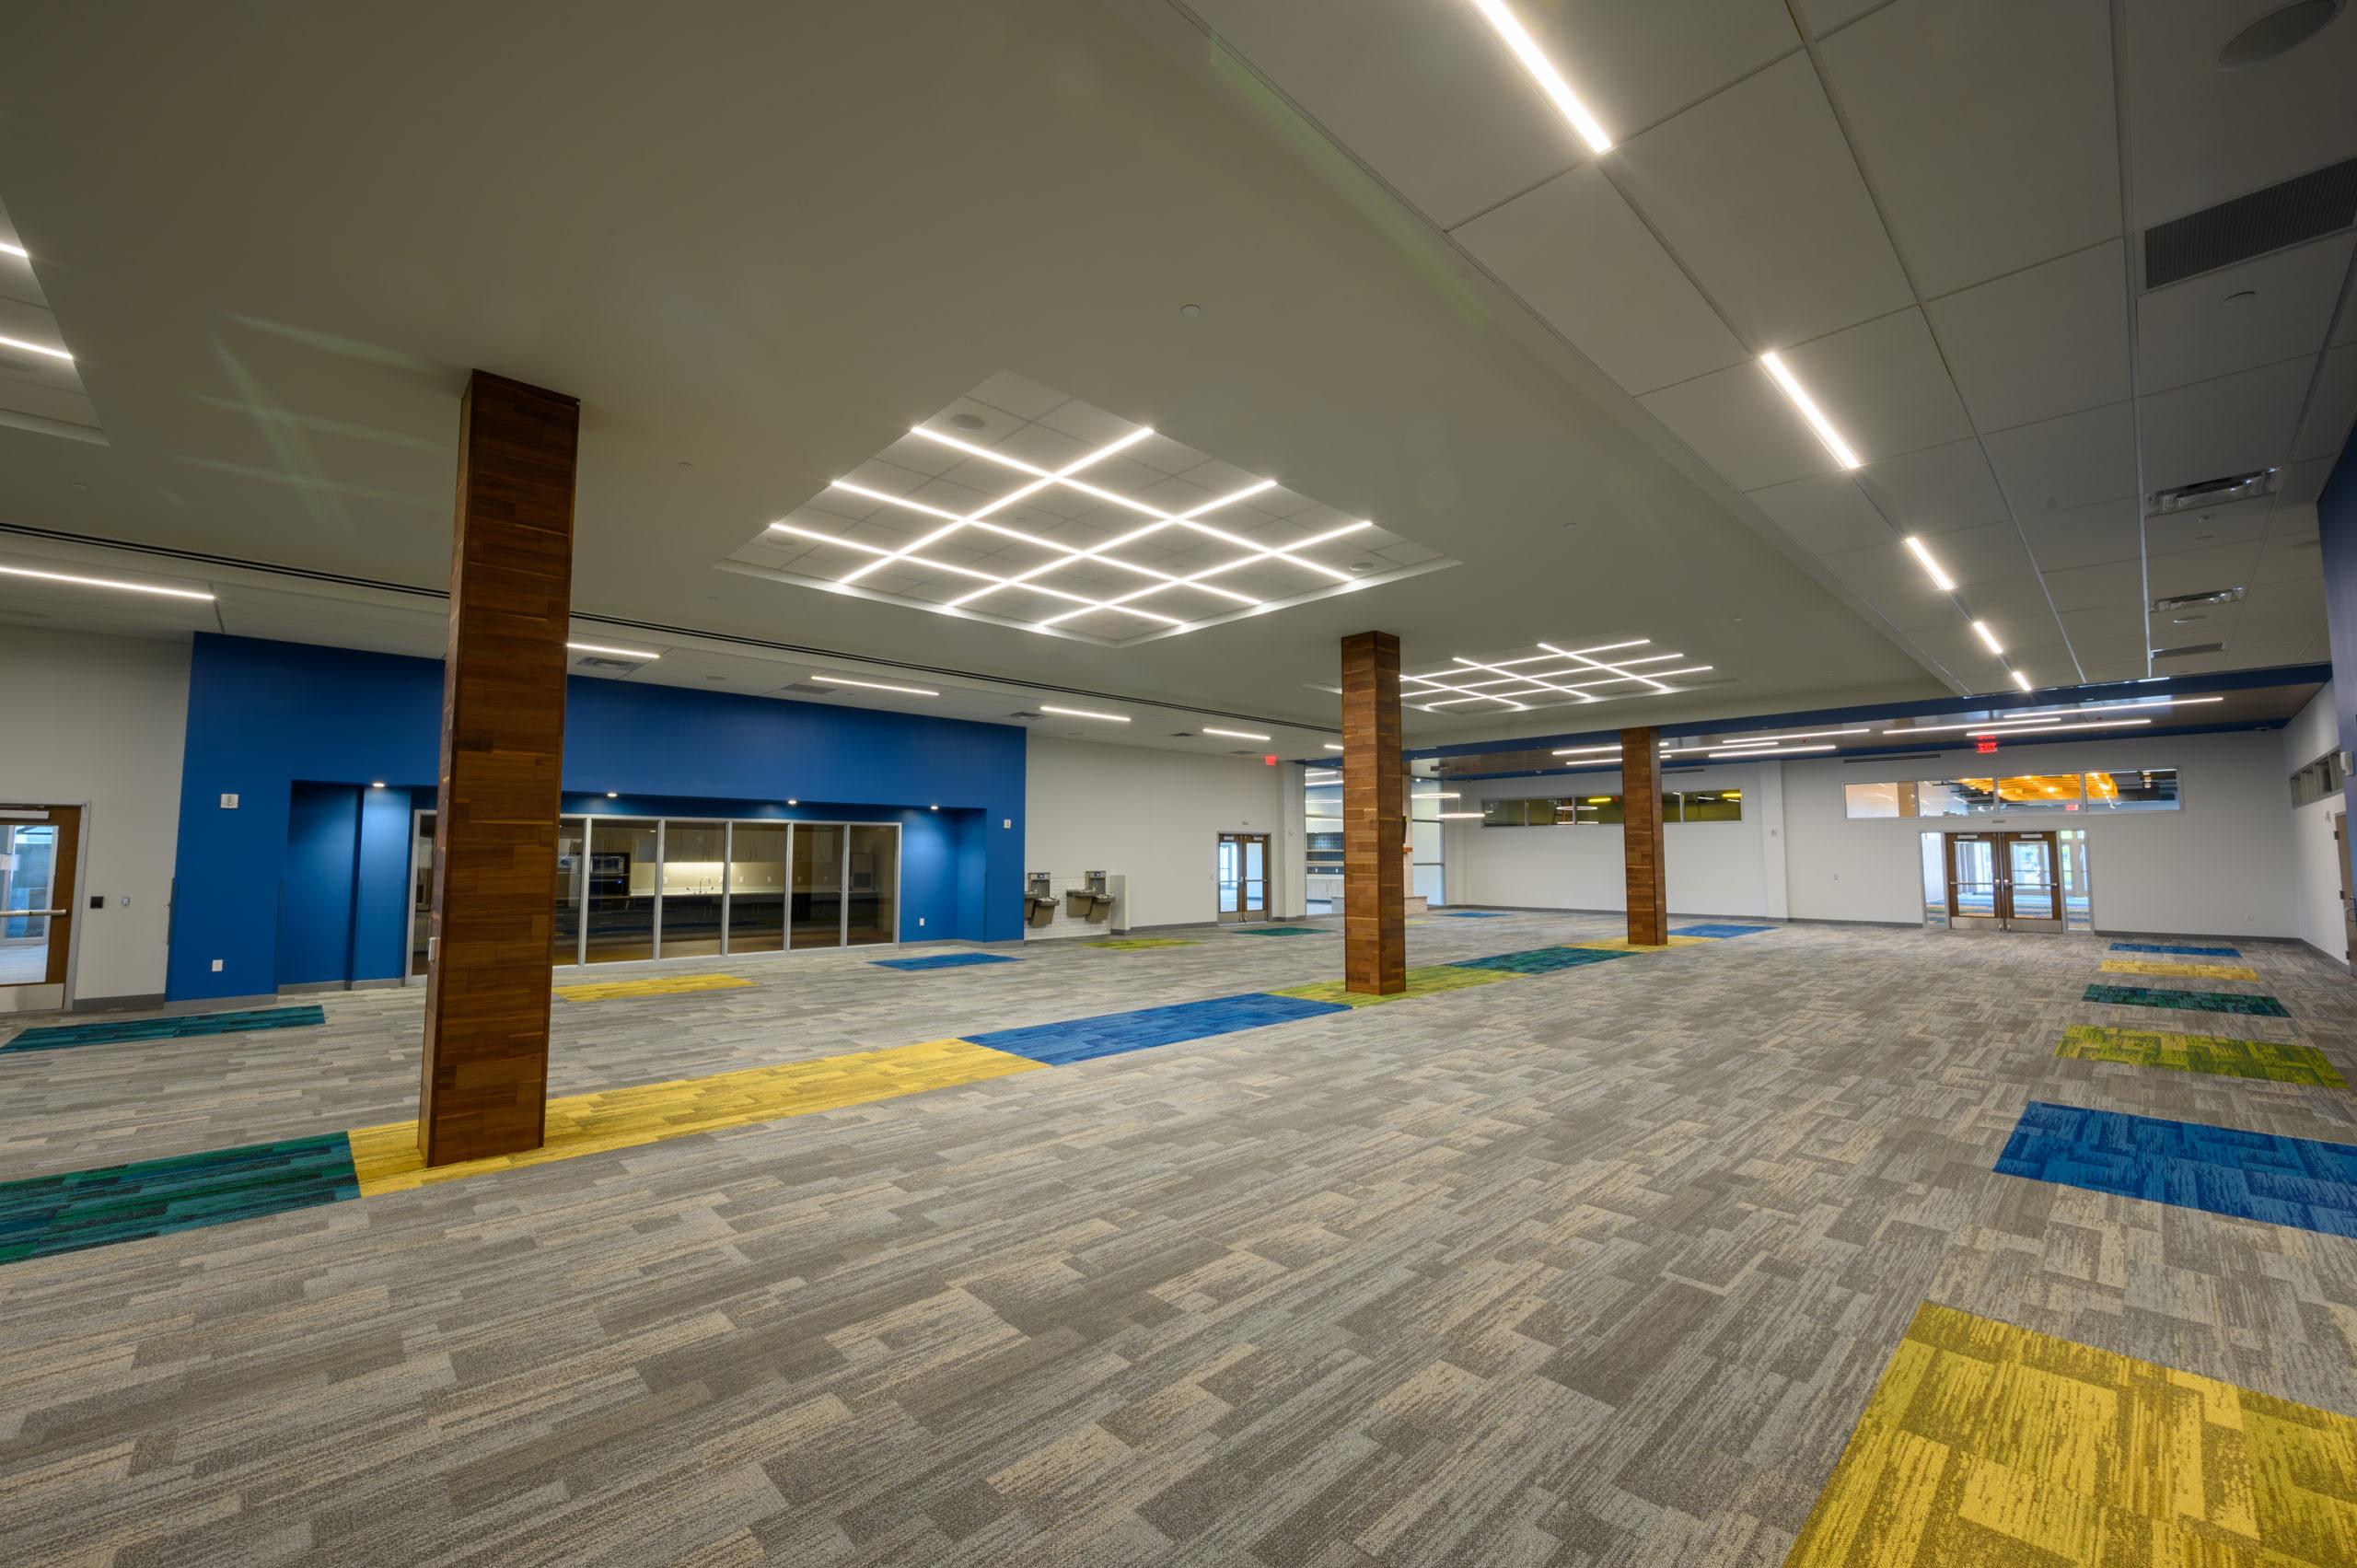 Charter School, Post-Construction Photography – September 2020